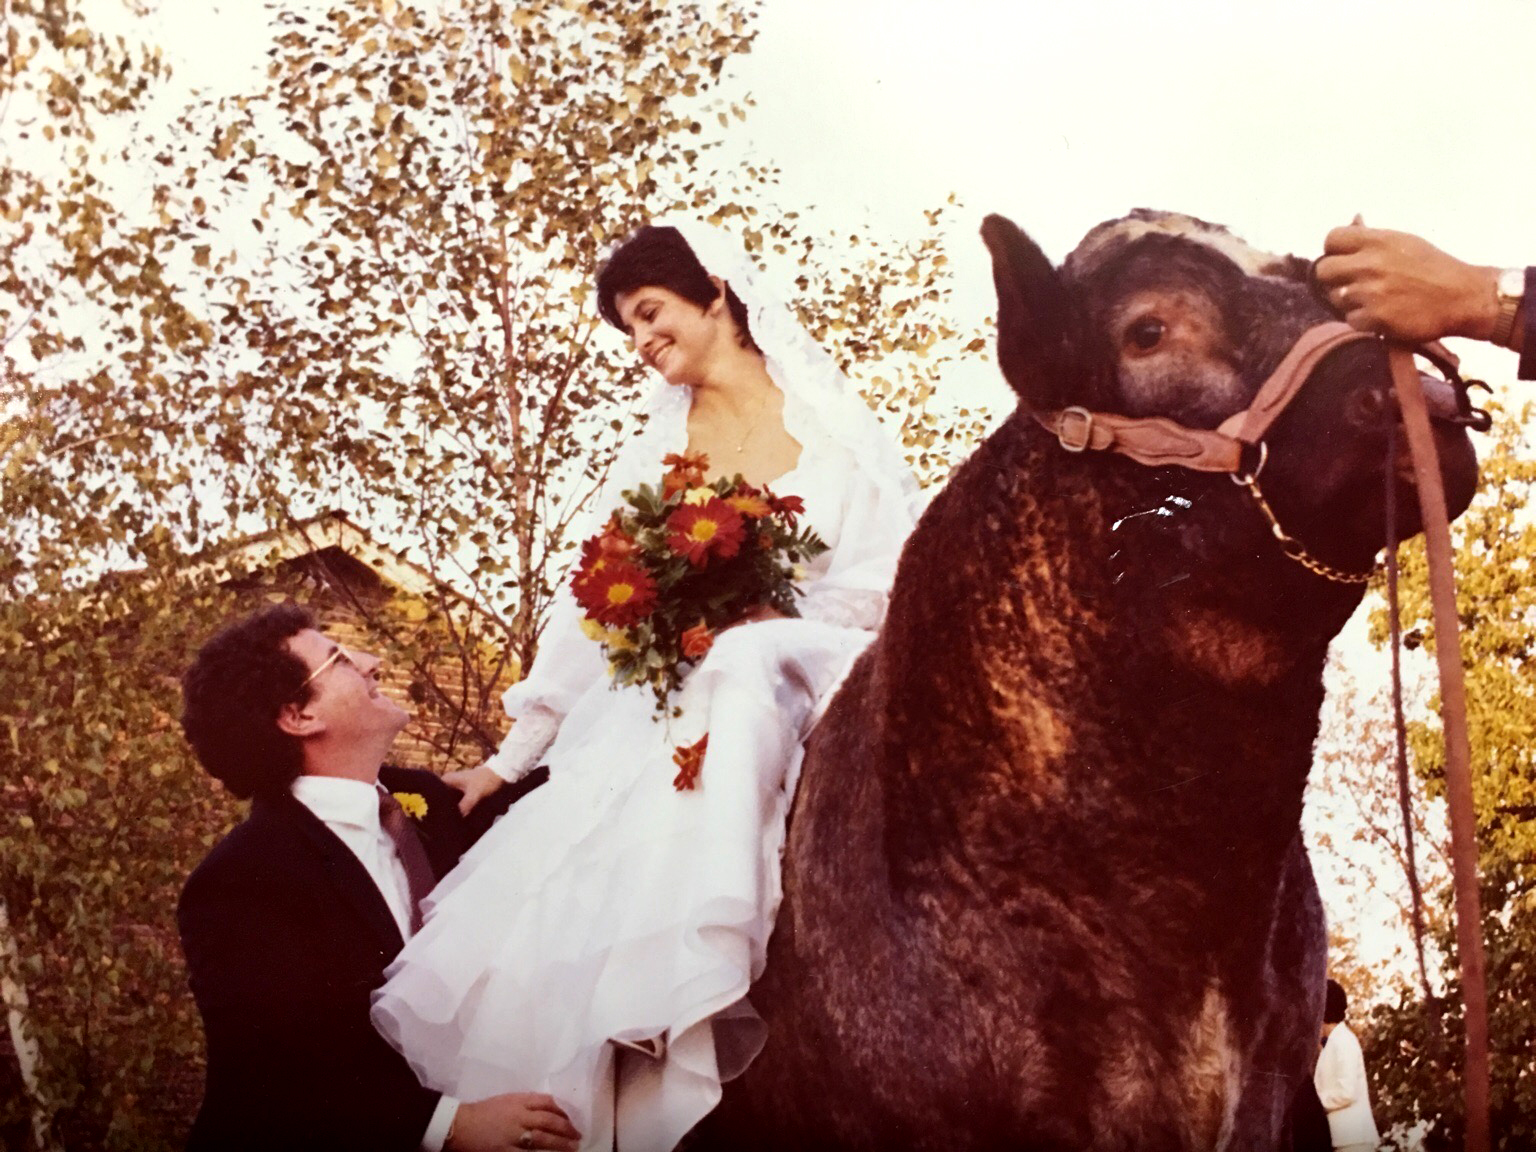 Wedding Day on the Bull